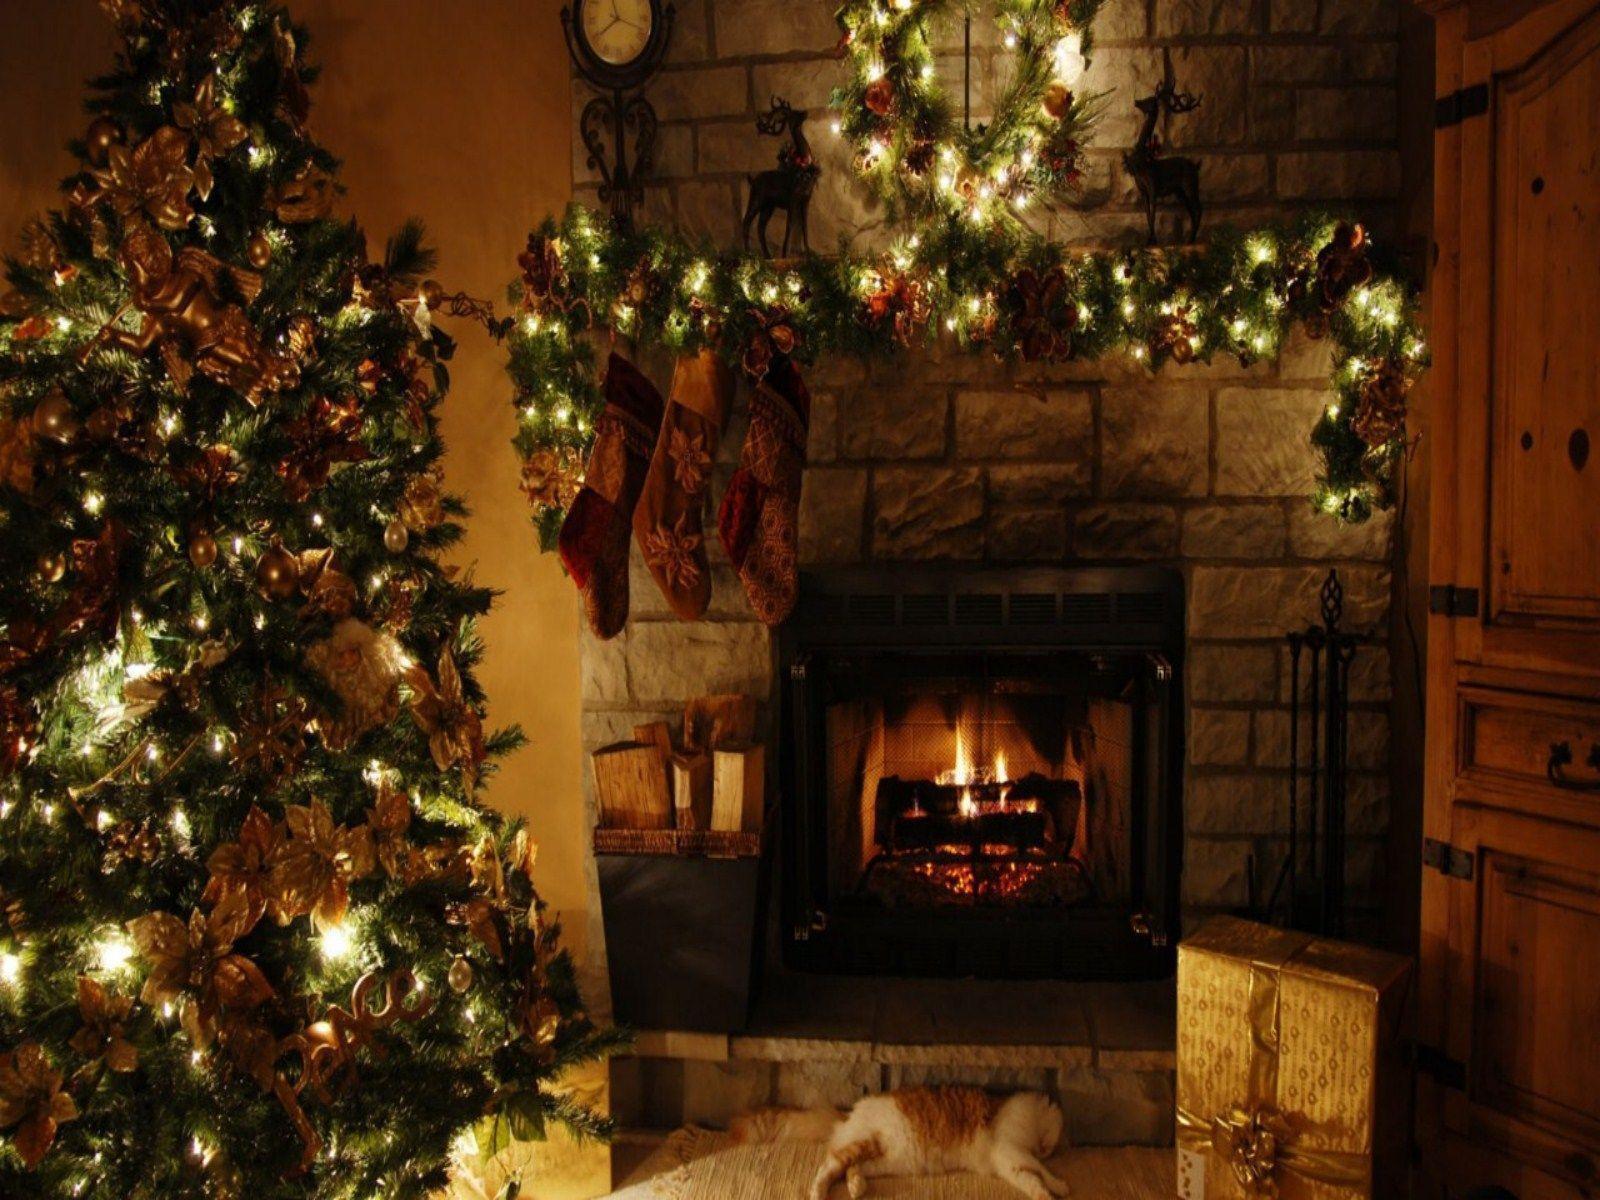 Christmas Wallpaper Fireplace  Christmas Fireplace Backgrounds Wallpaper Cave